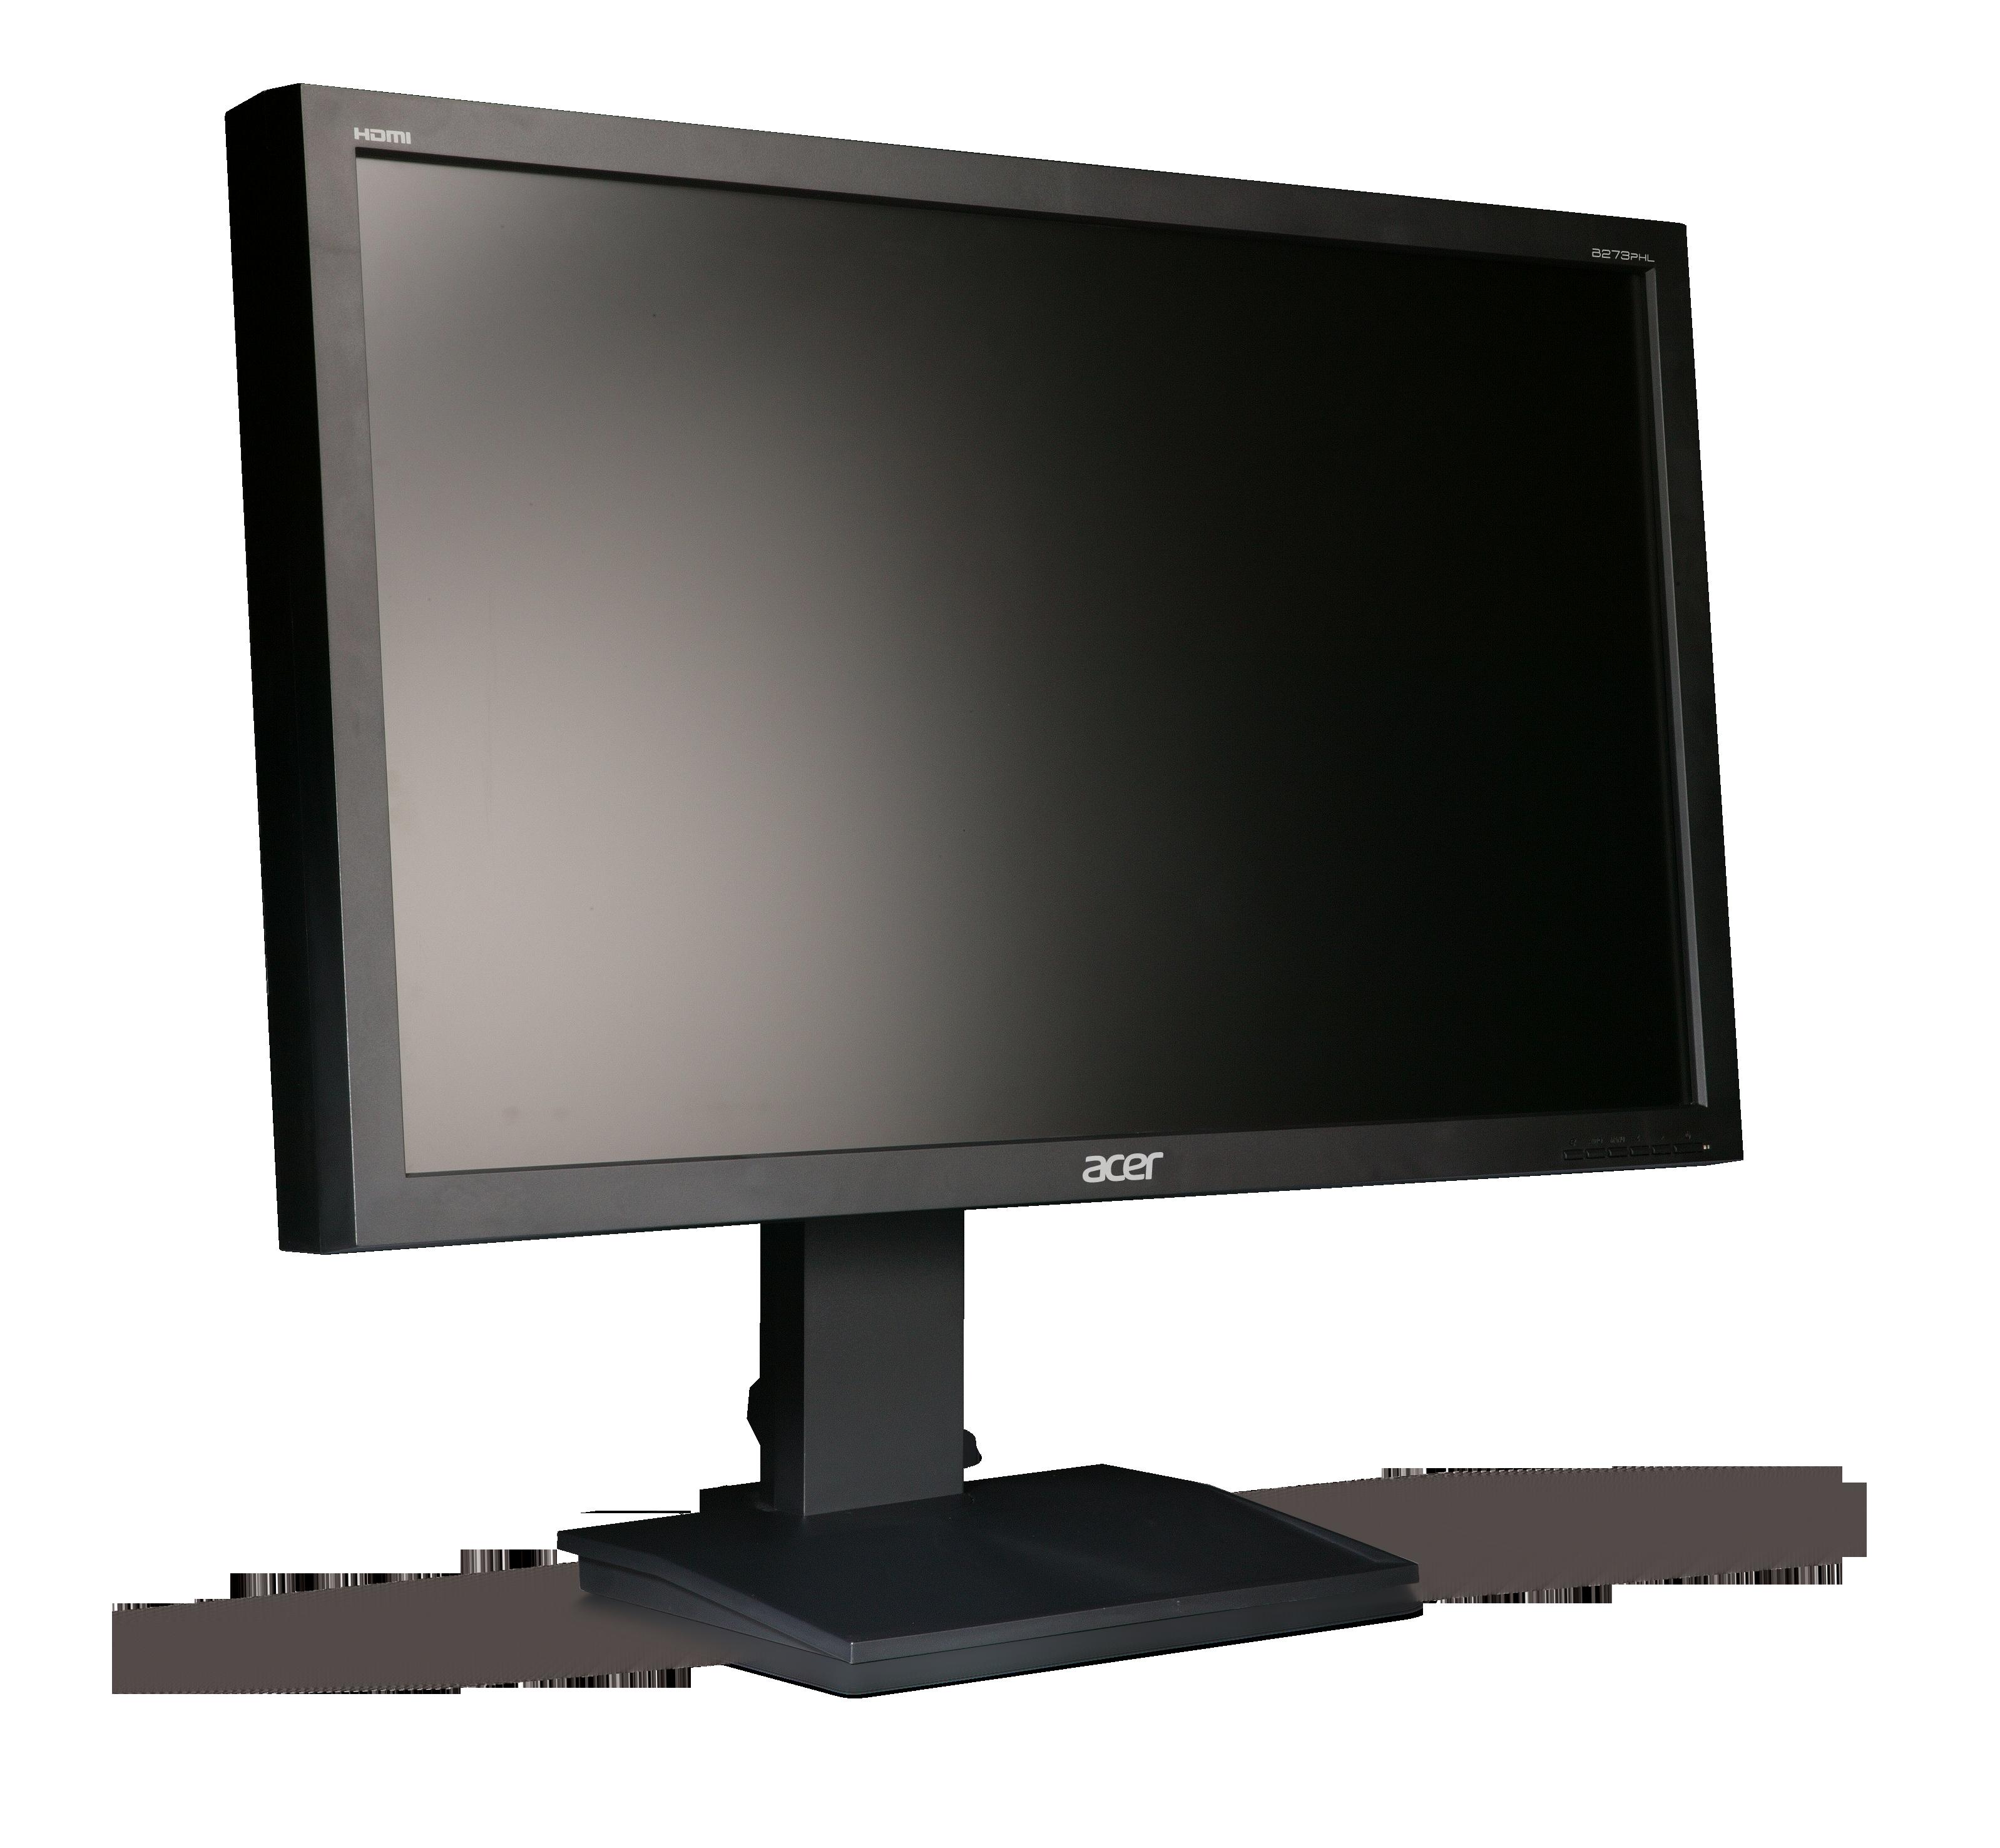 Monitor PNG - 1525